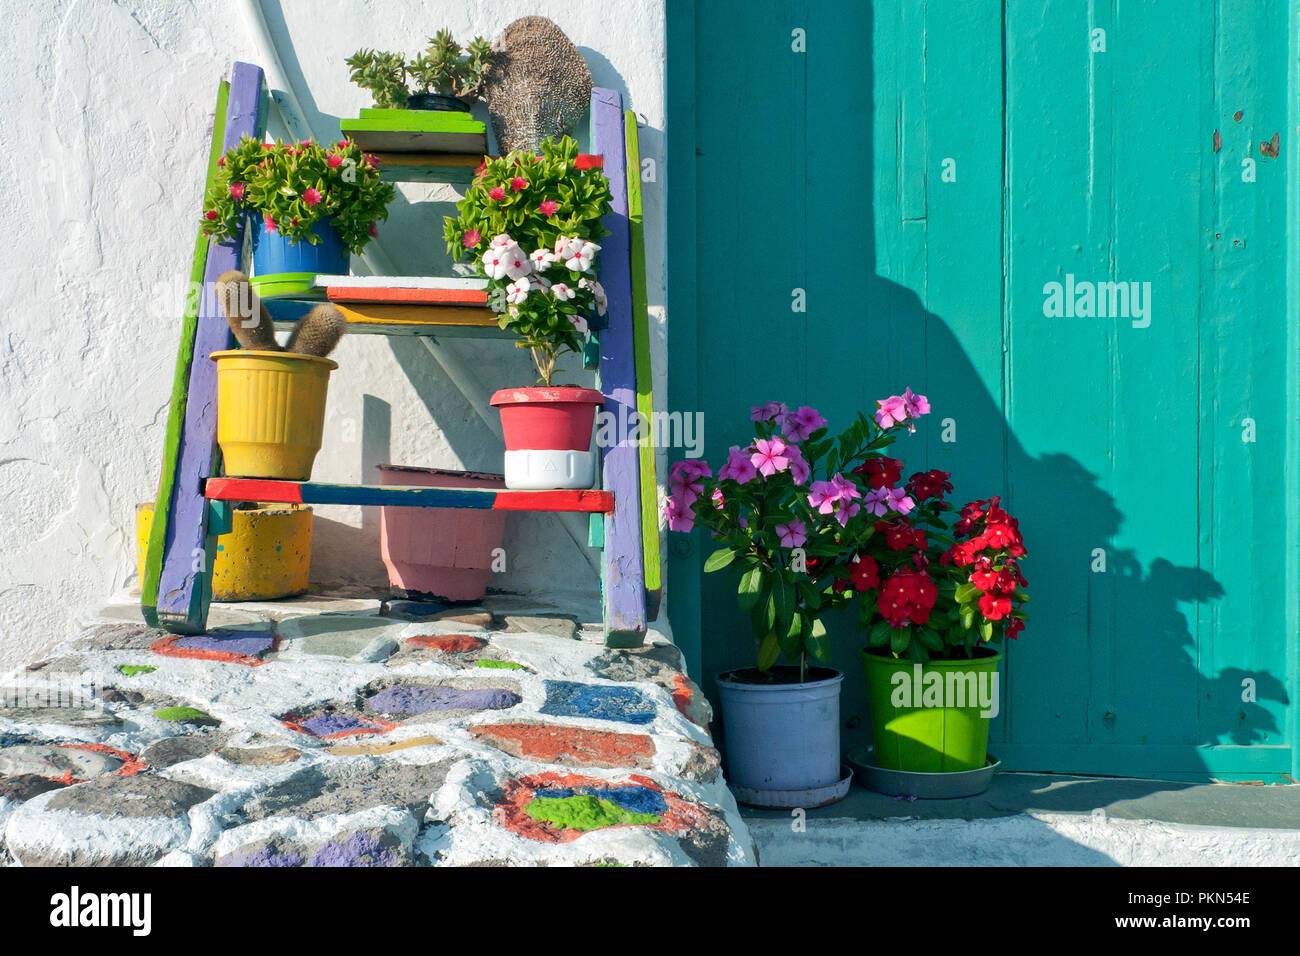 Milos, Klima village, Greece,09/13/2012: flowers in Klima village - Stock Image